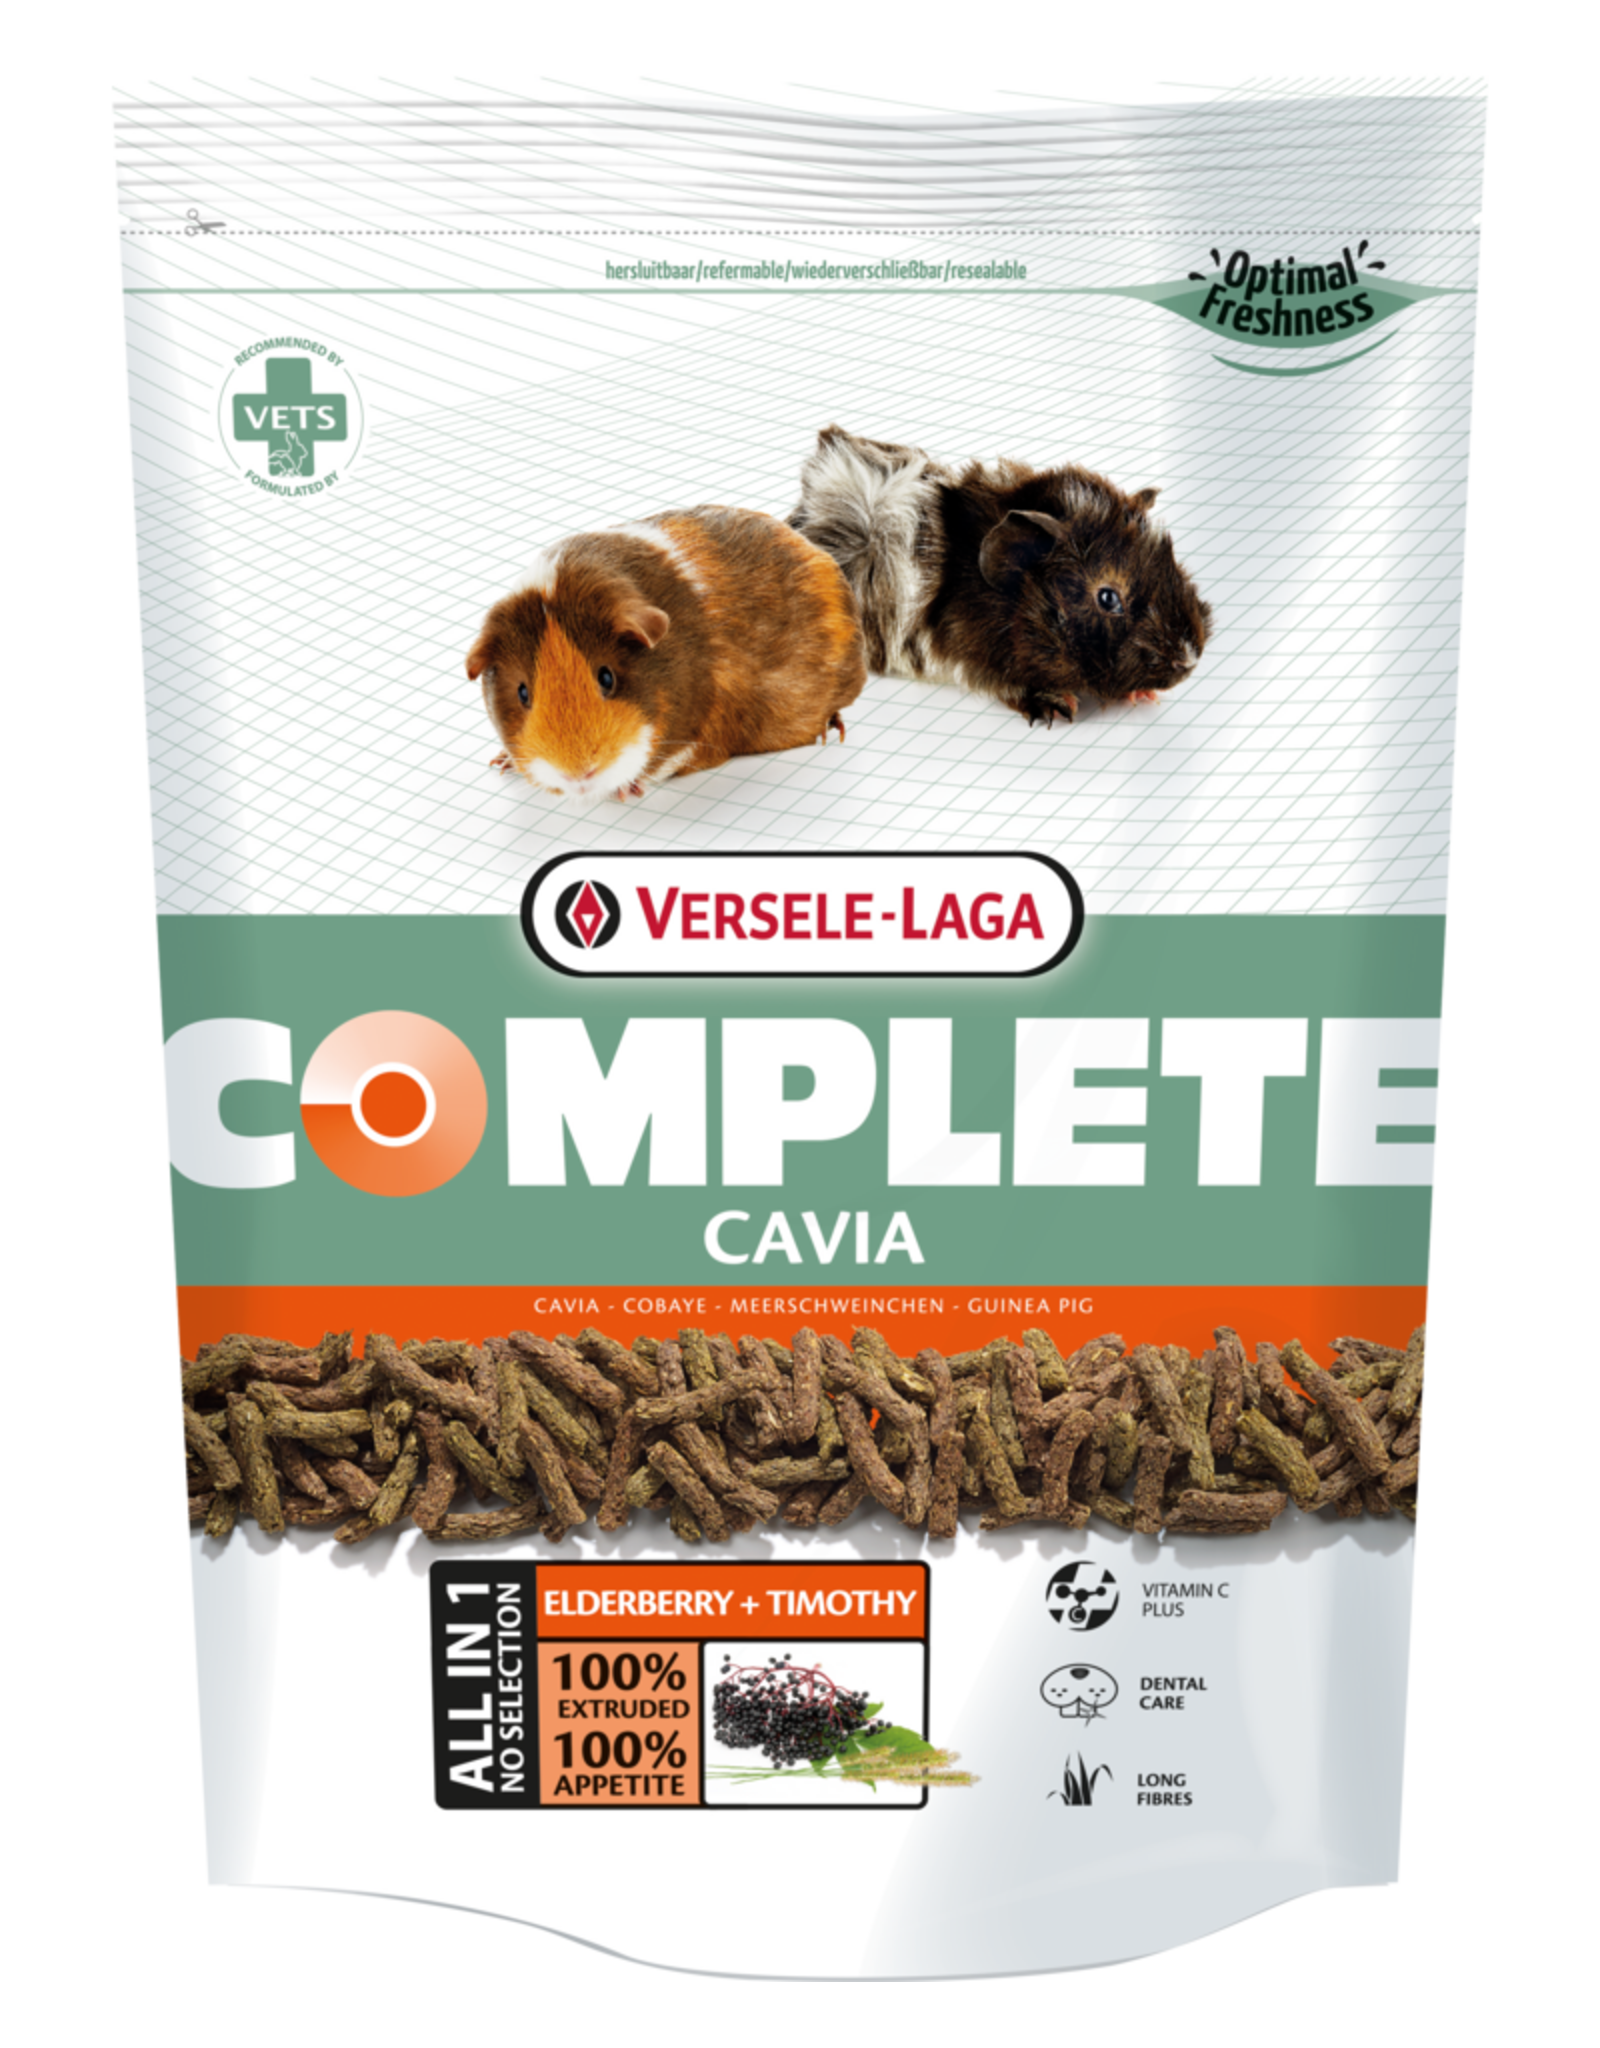 Versele laga Cavia Complete - 500 Gram